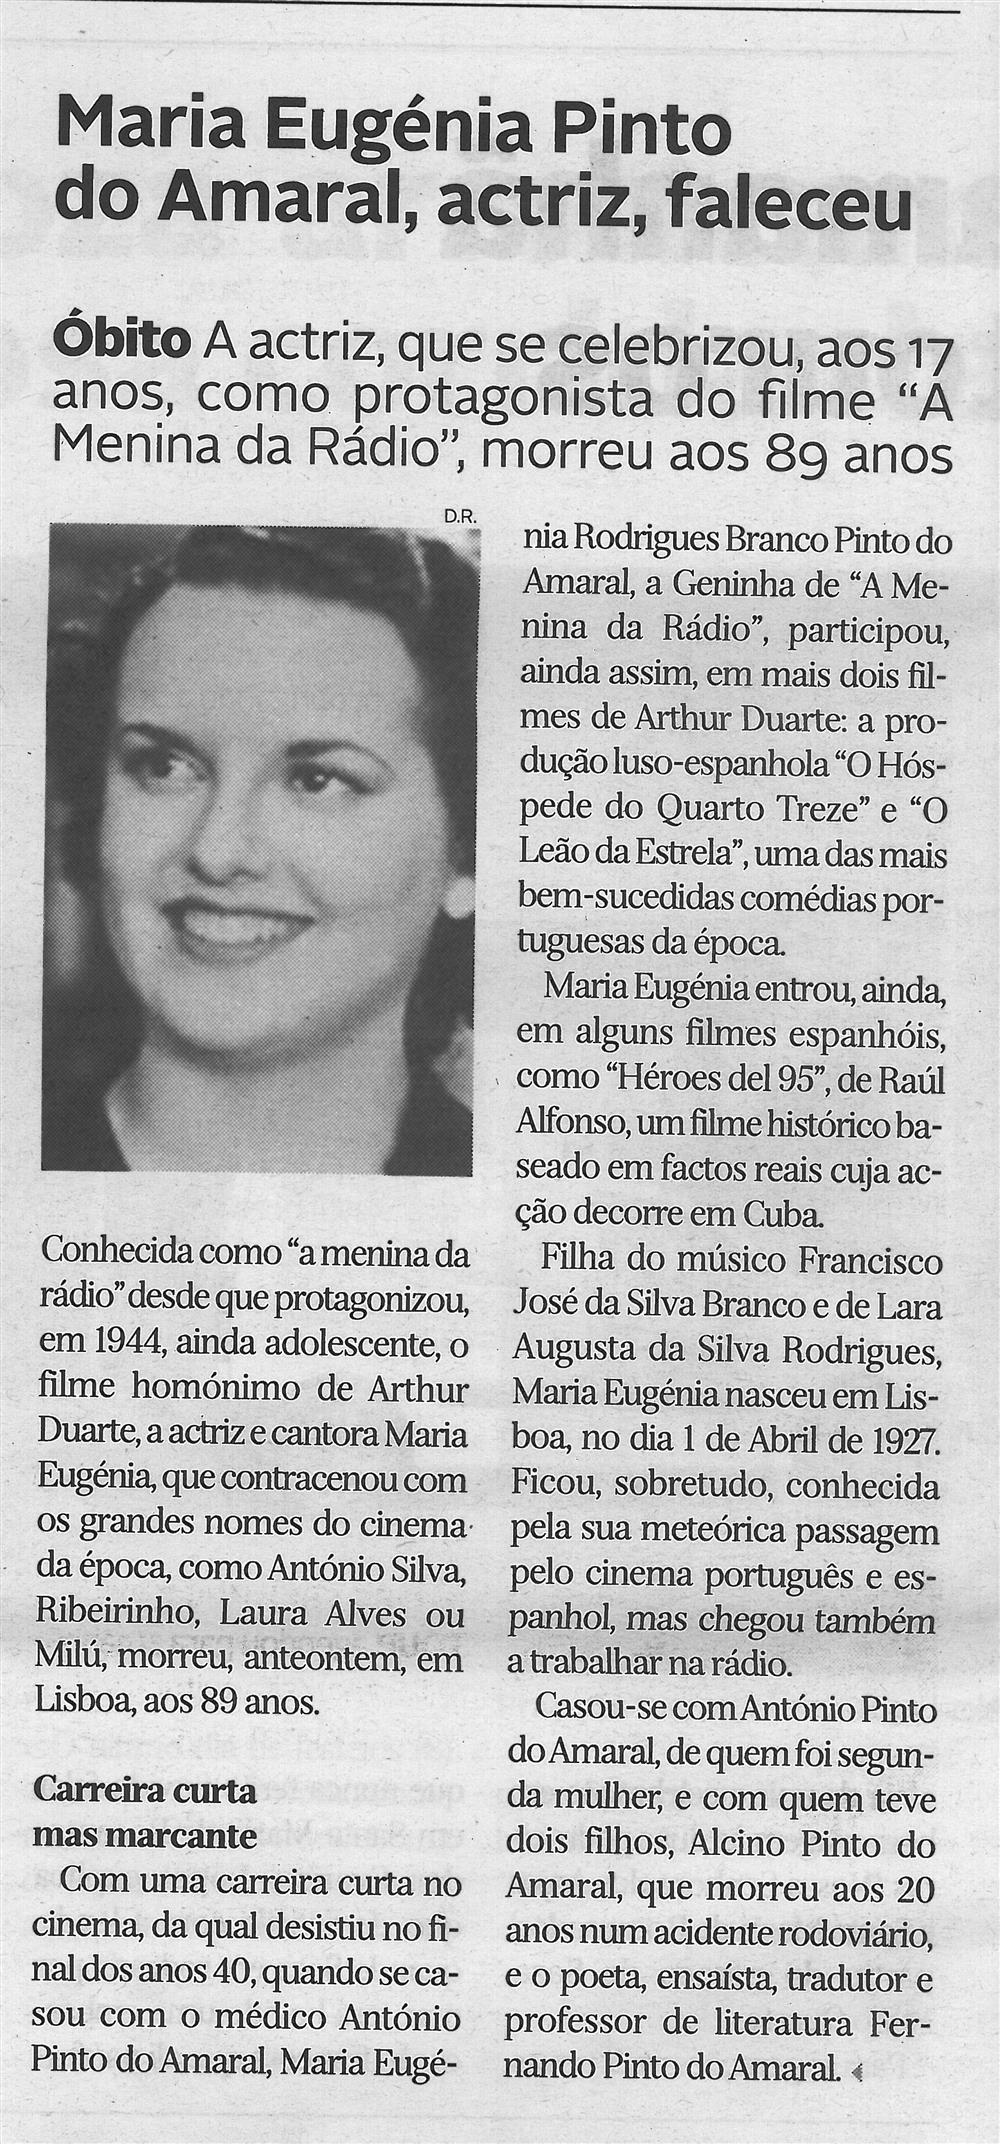 DA-27ago.'16-p.8-Maria Eugénia Pinto do Amaral, actriz, faleceu.jpg